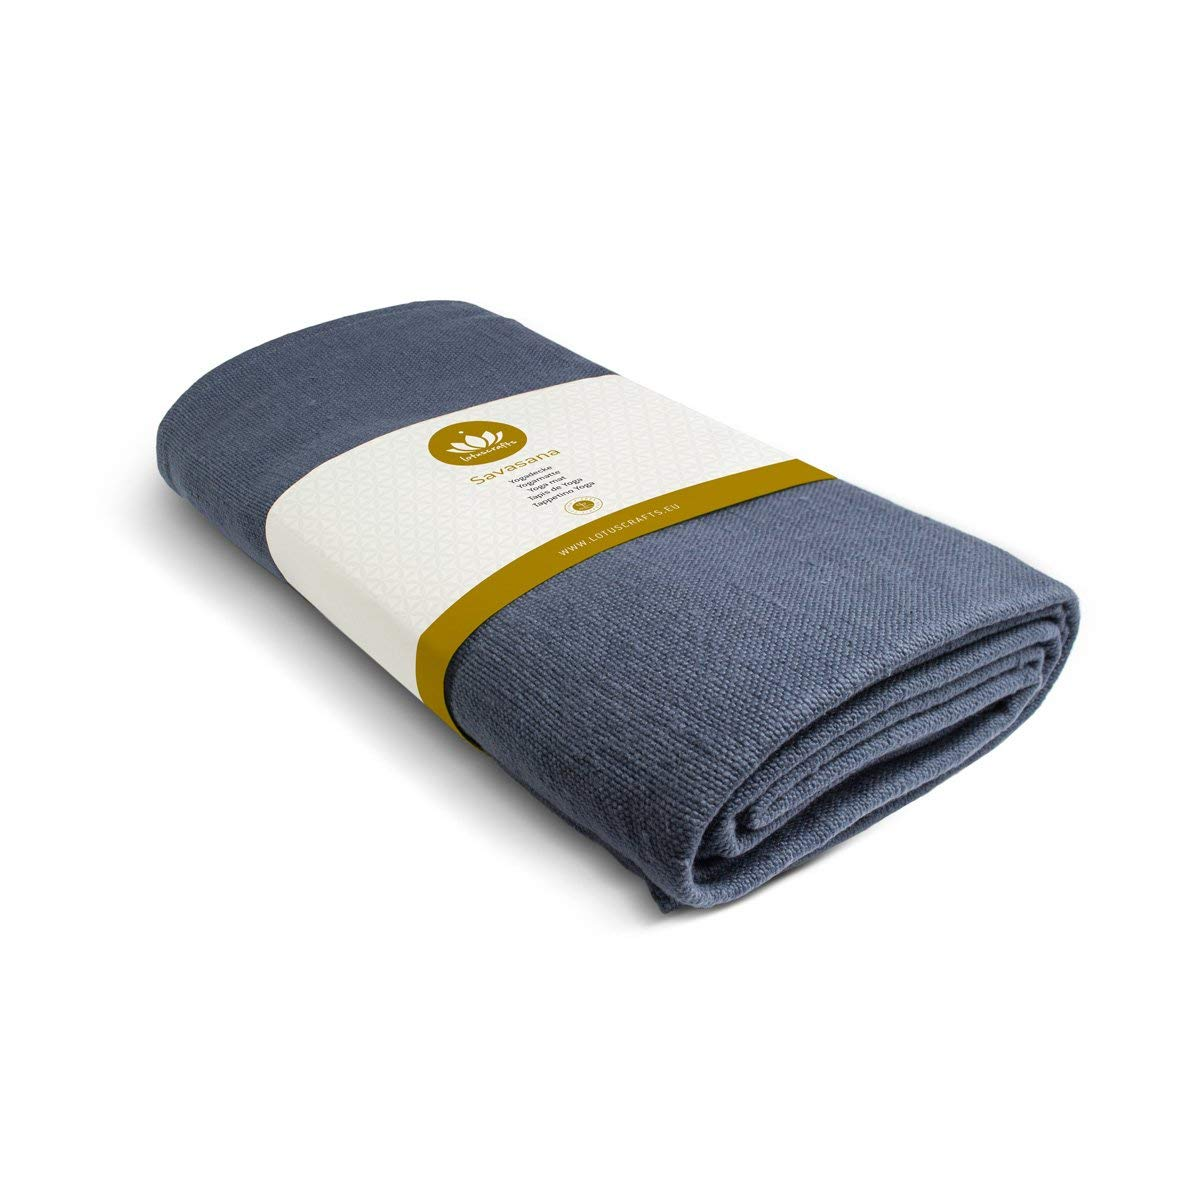 80 x 60 Lotuscrafts Yoga Blanket Cotton Savasana Meditation Blanket Travel Blanket Picnic Blanket Camping Blanket Throw Blanket 100/% Organic Cotton Yoga Rug Mexican Blanket Yoga